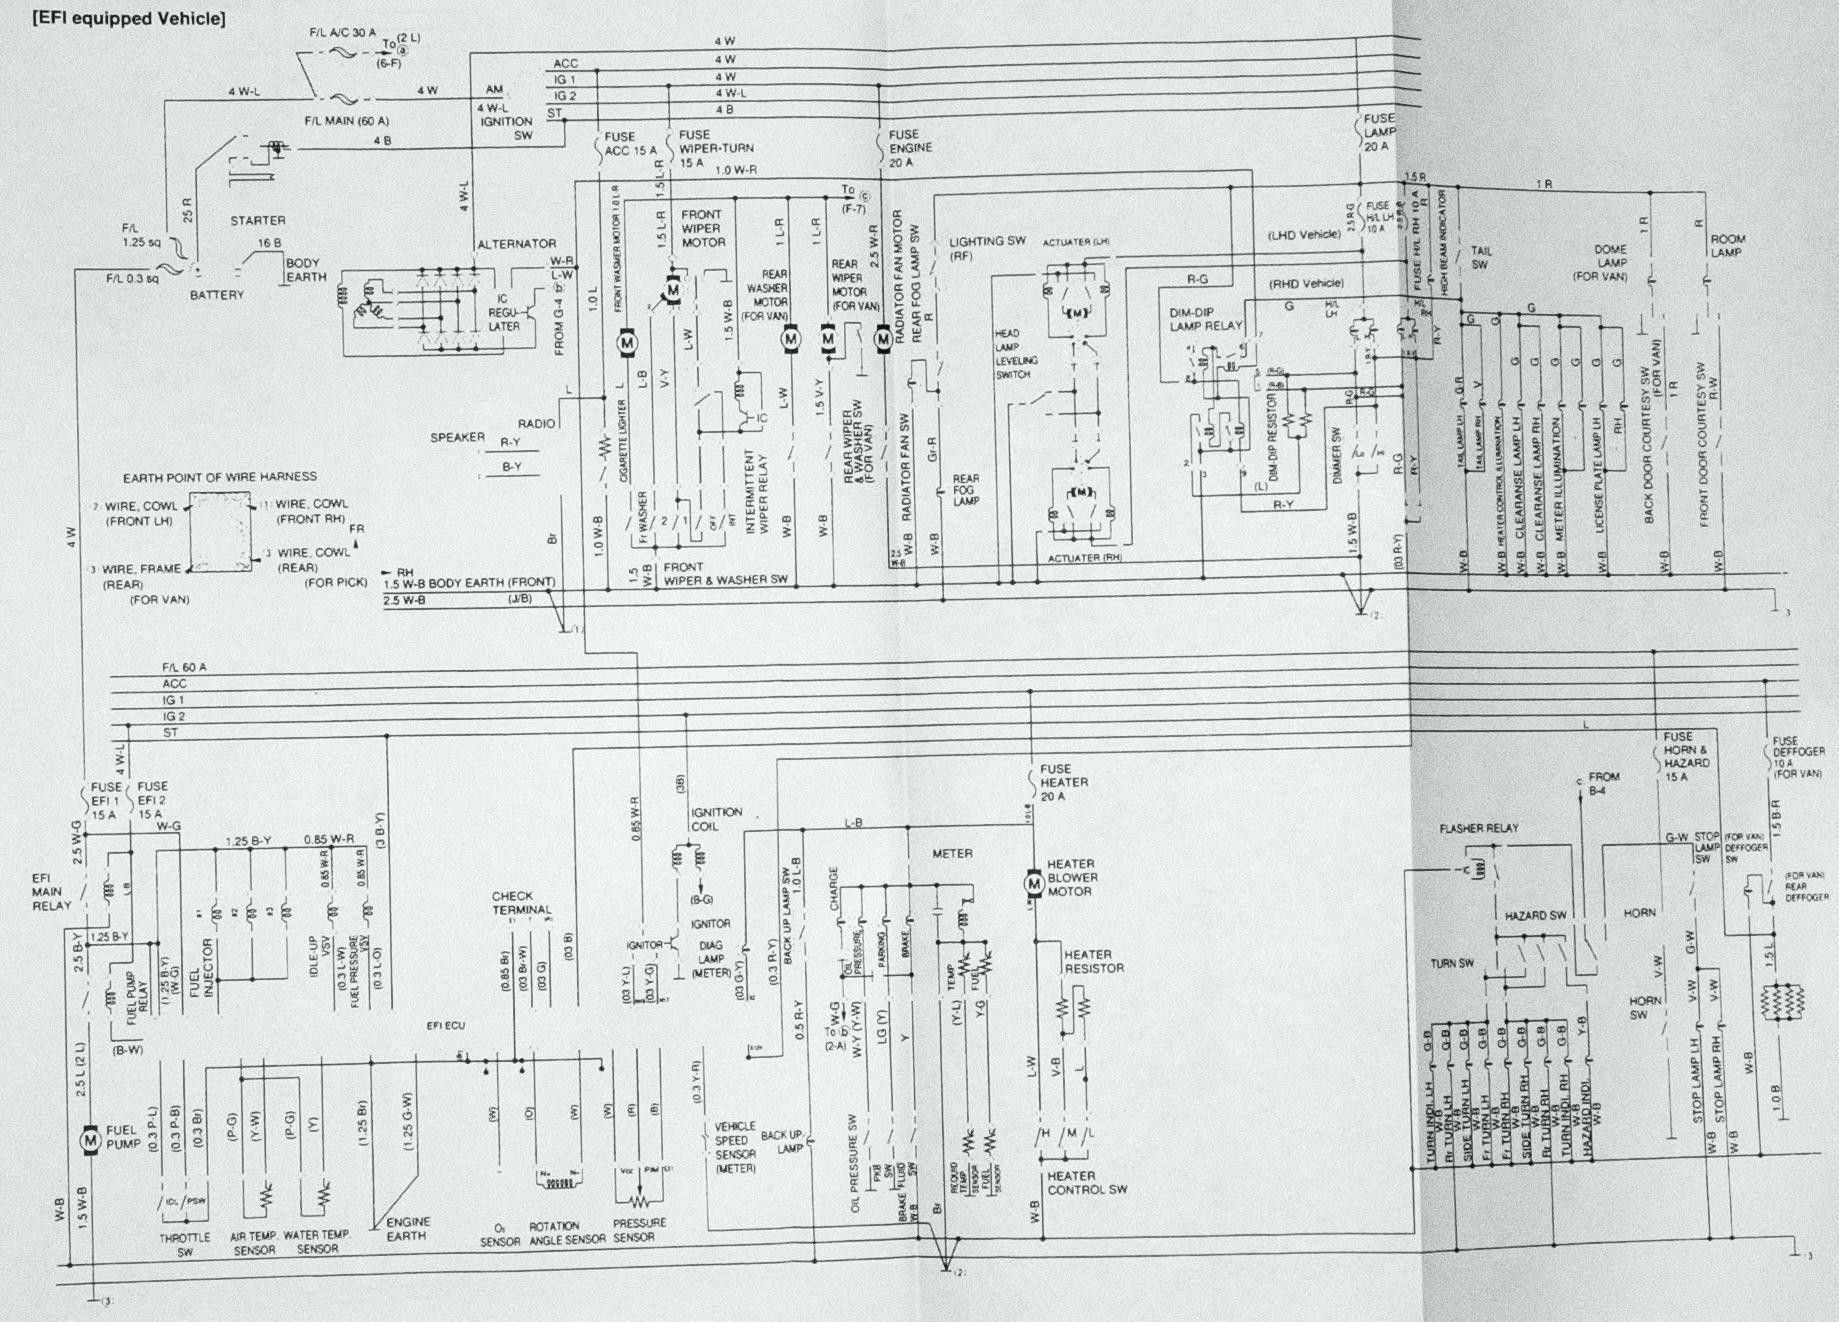 Unique Car Stereo Radio Wiring Diagram diagramsample